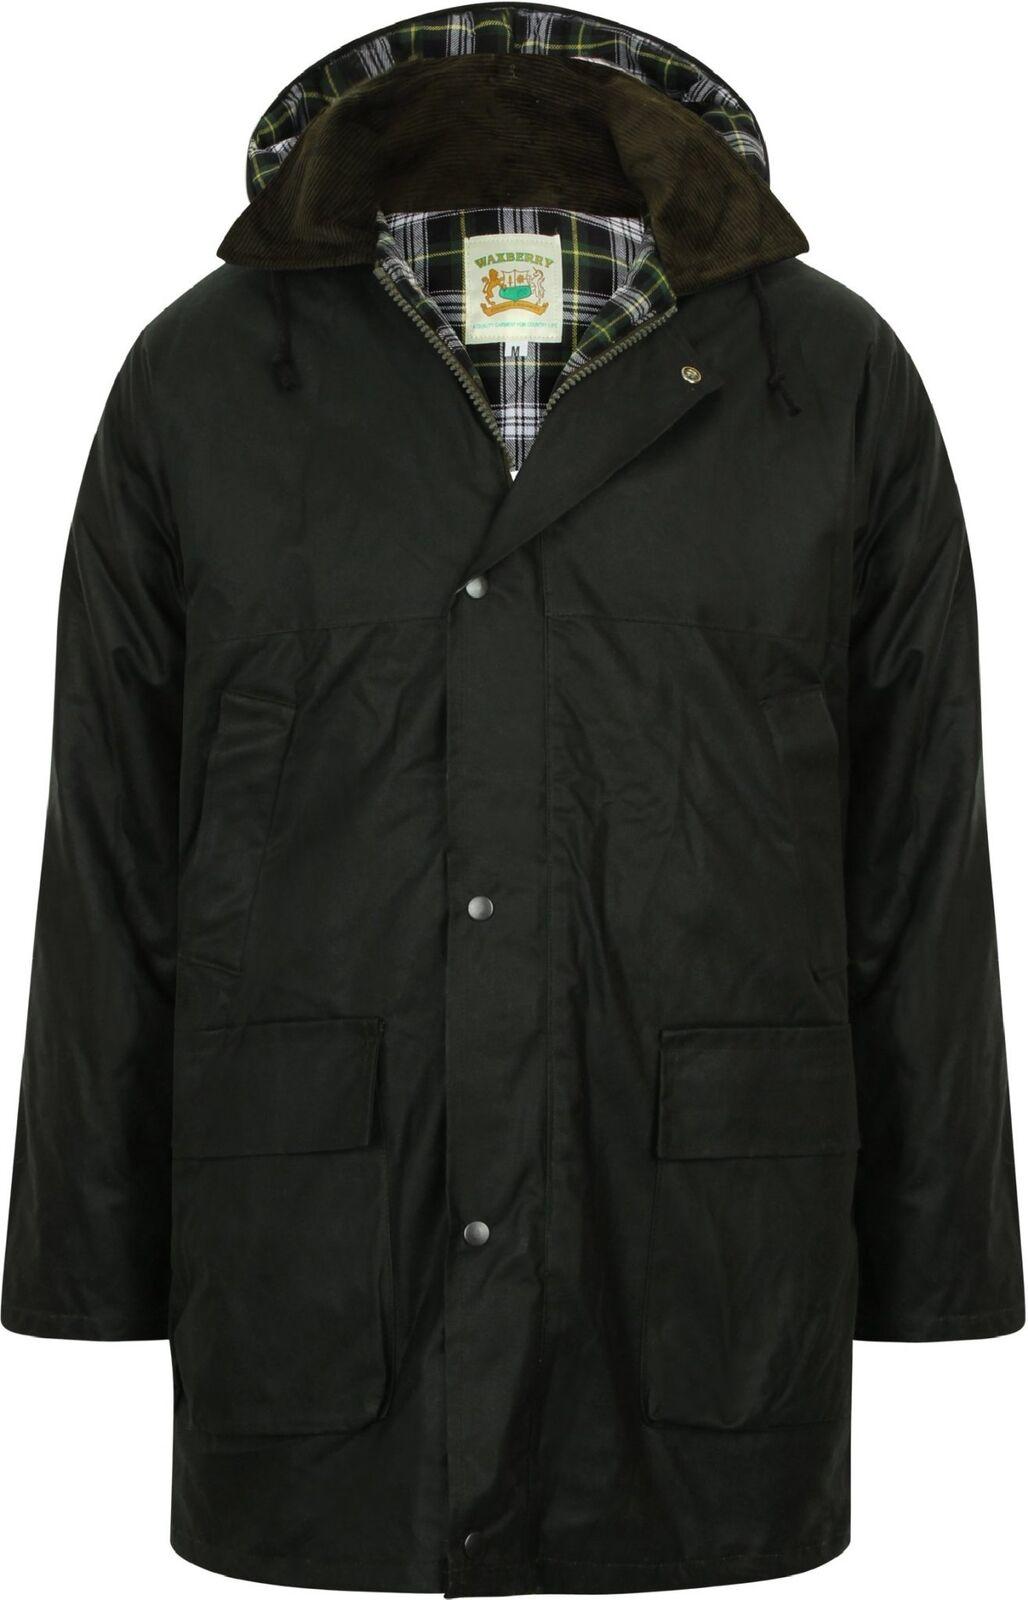 Made in UK Padded Waistcoat Waterproof Outdoor Gilet Nicky Adams Mens Wax Quilted Bodywarmer